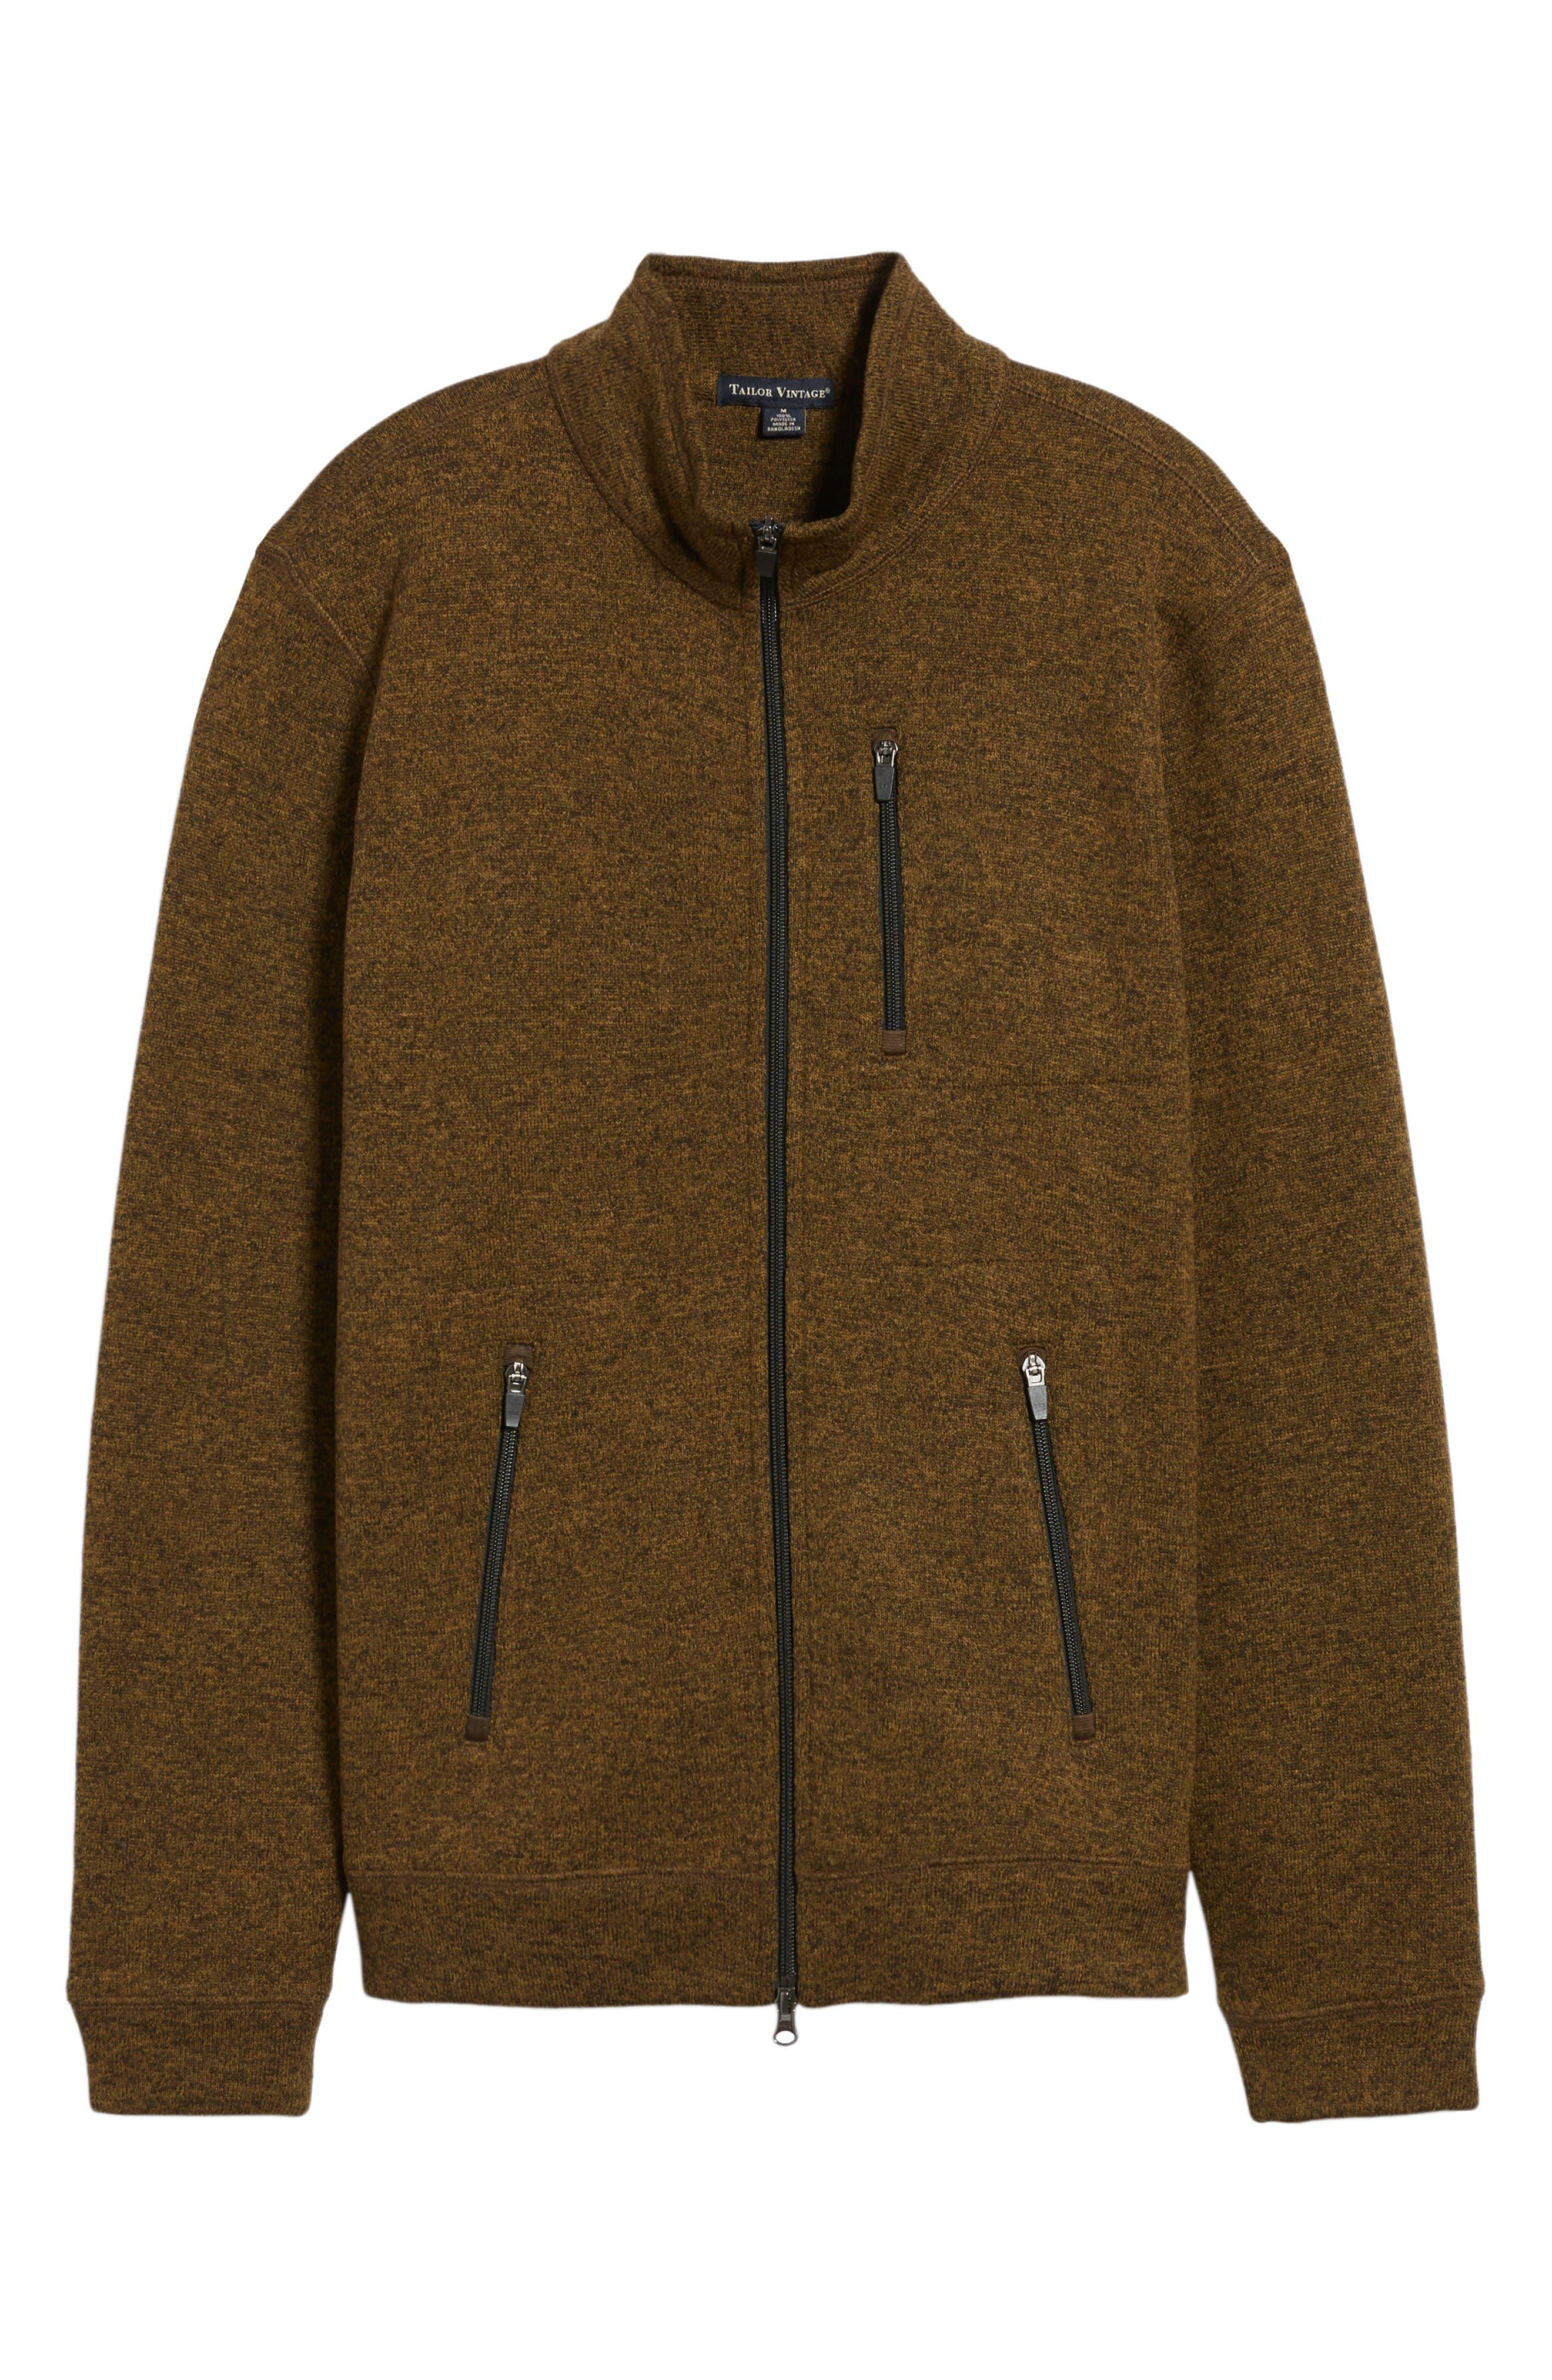 Sweater Knit Fleece Zip Front Jacket,                             Alternate thumbnail 17, color,